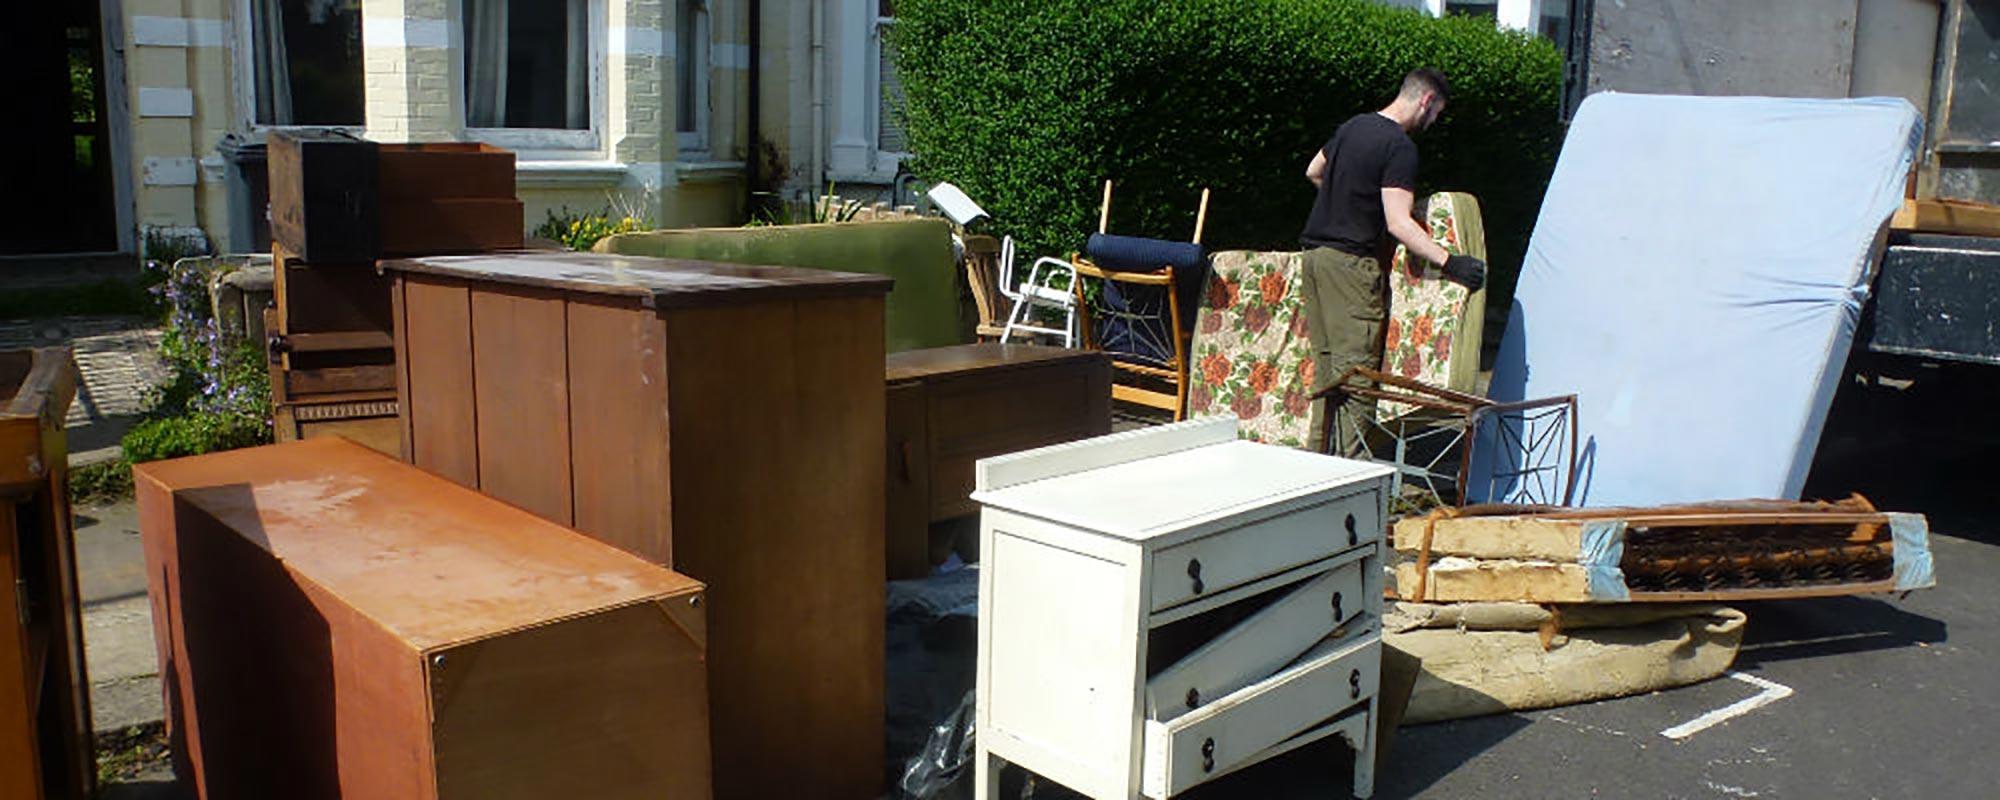 Furniture Disposal London London Furniture Disposal